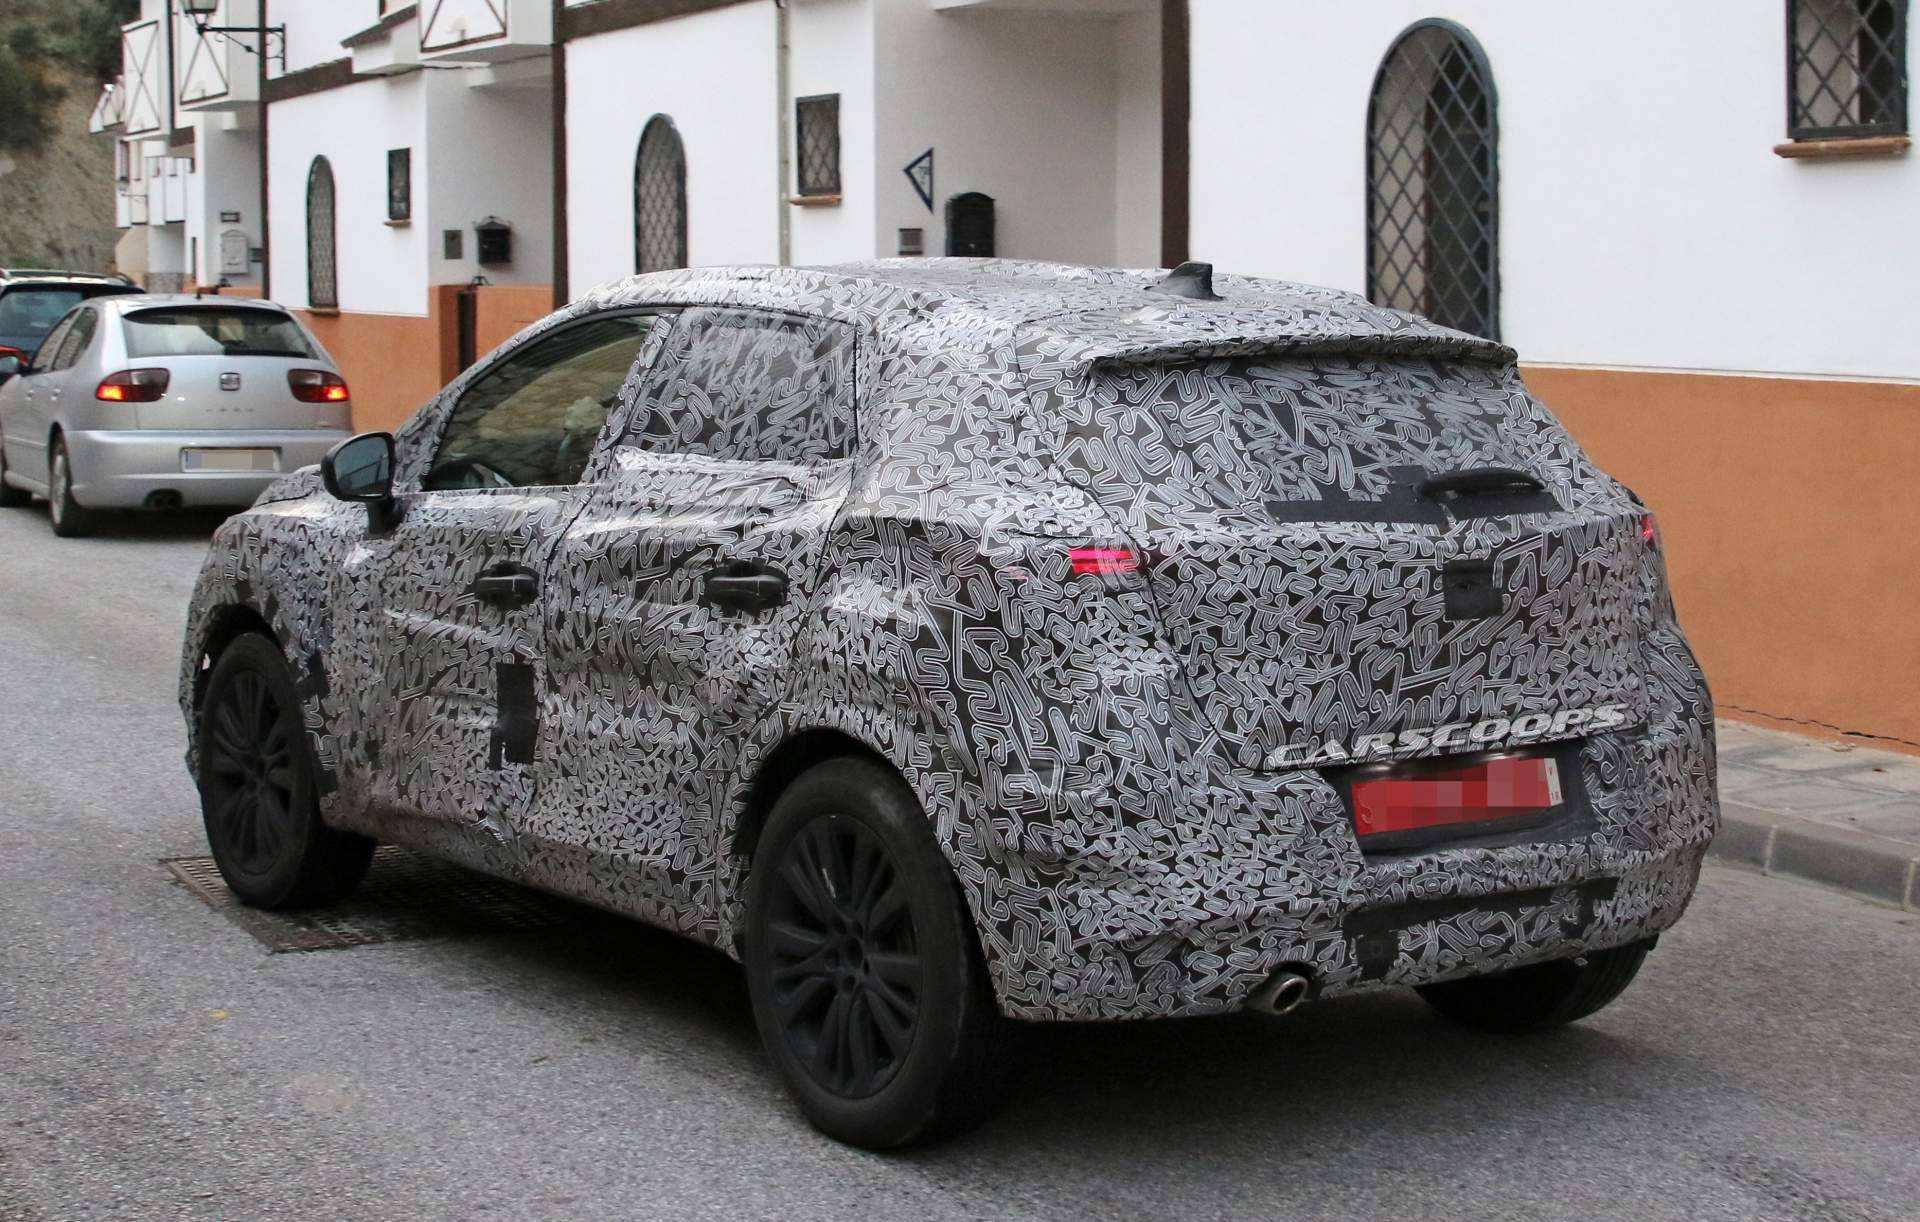 69 New Renault Kaptur 2019 Reviews for Renault Kaptur 2019